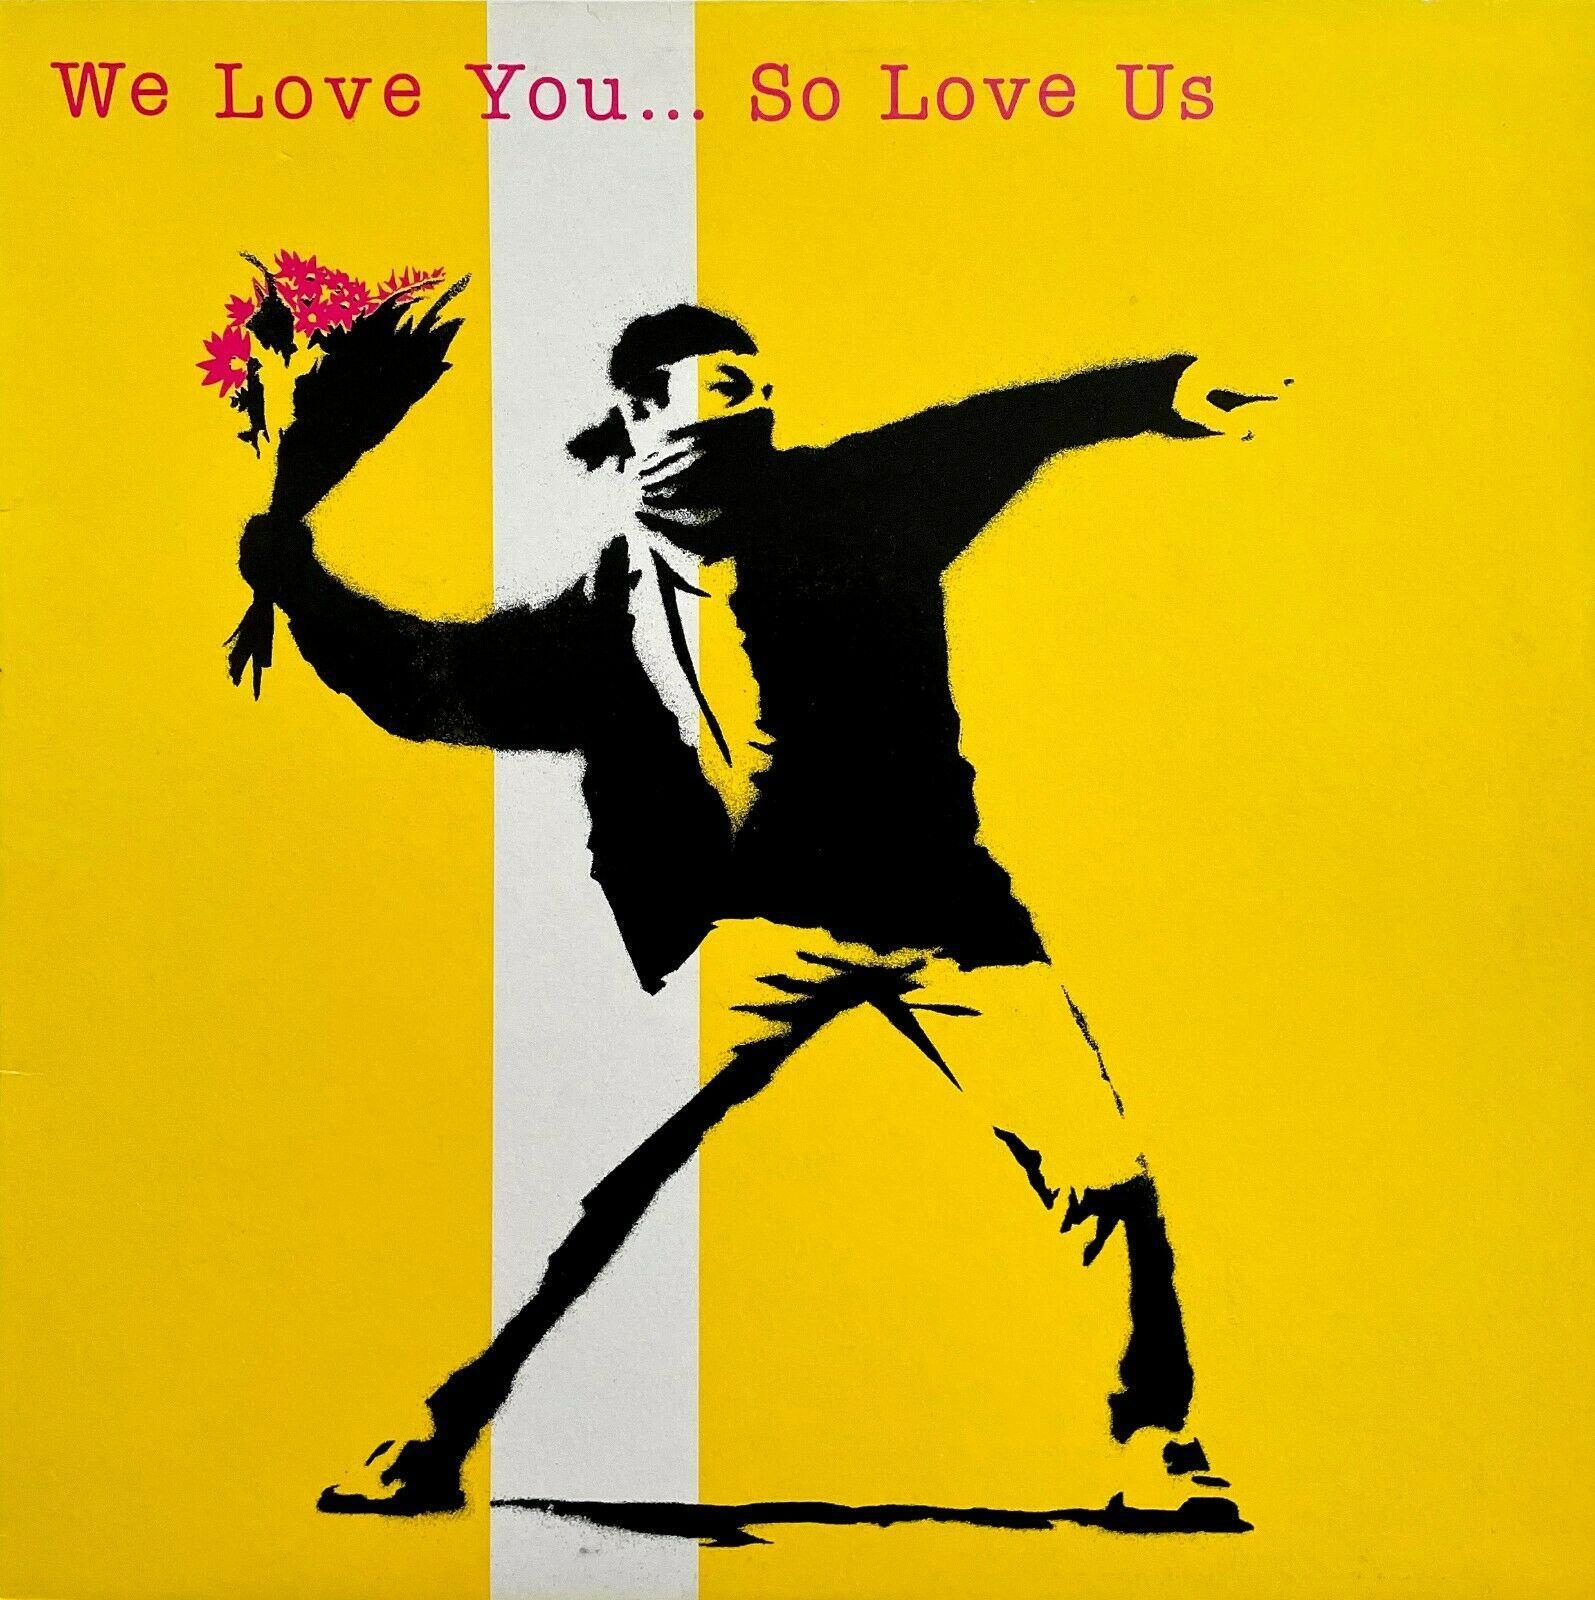 We Love You... So Love Us, Vinyl Record Sleeve